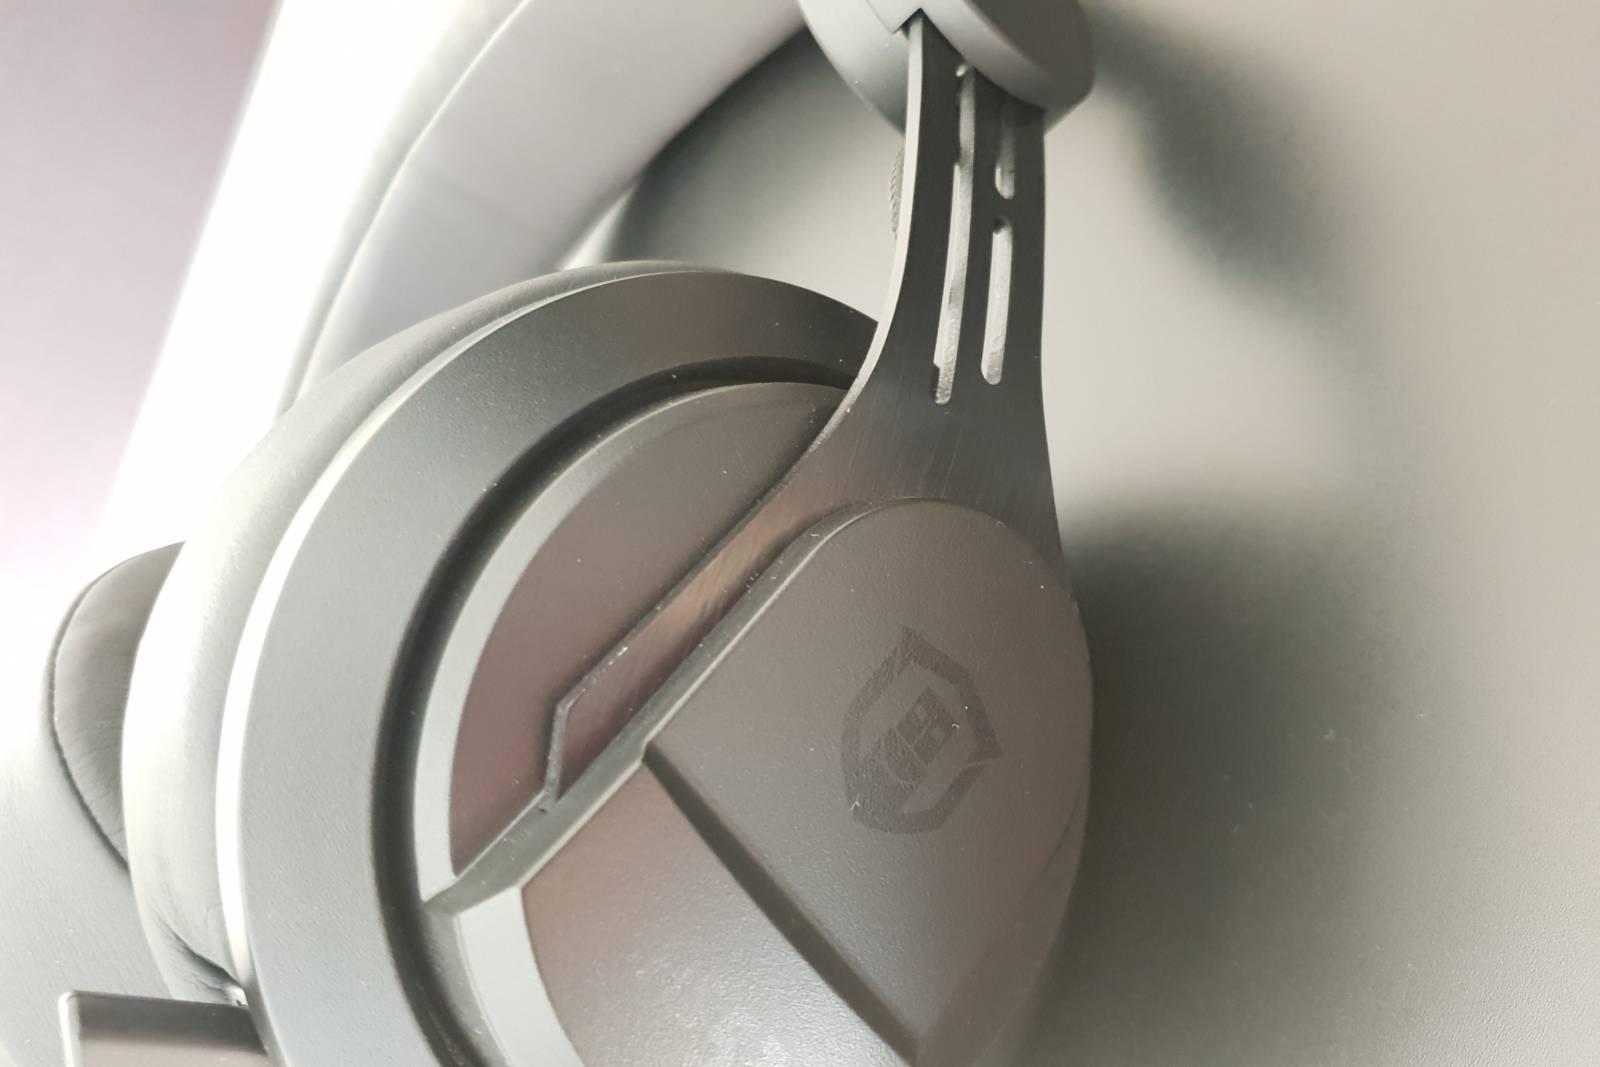 Close-up image of Plugable Onyx Hs53